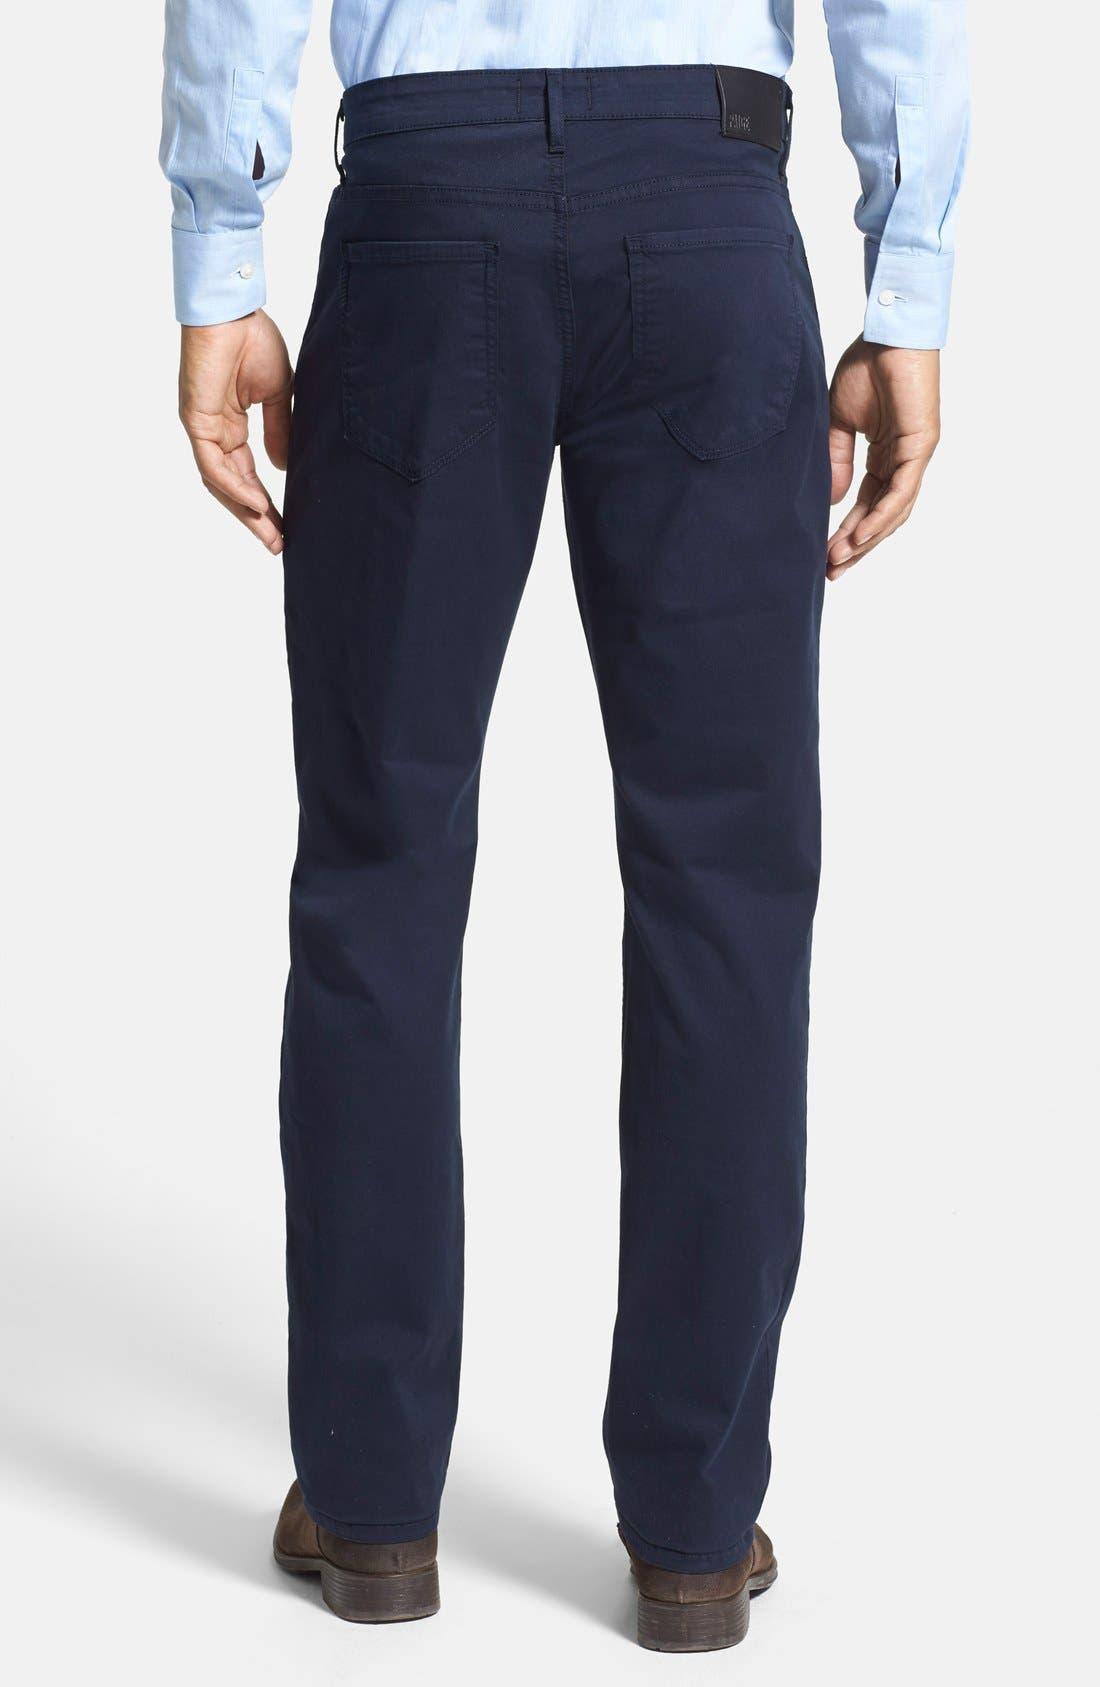 PAIGE, Normandie Slim Straight Leg Twill Pants, Alternate thumbnail 5, color, NAVY CADET